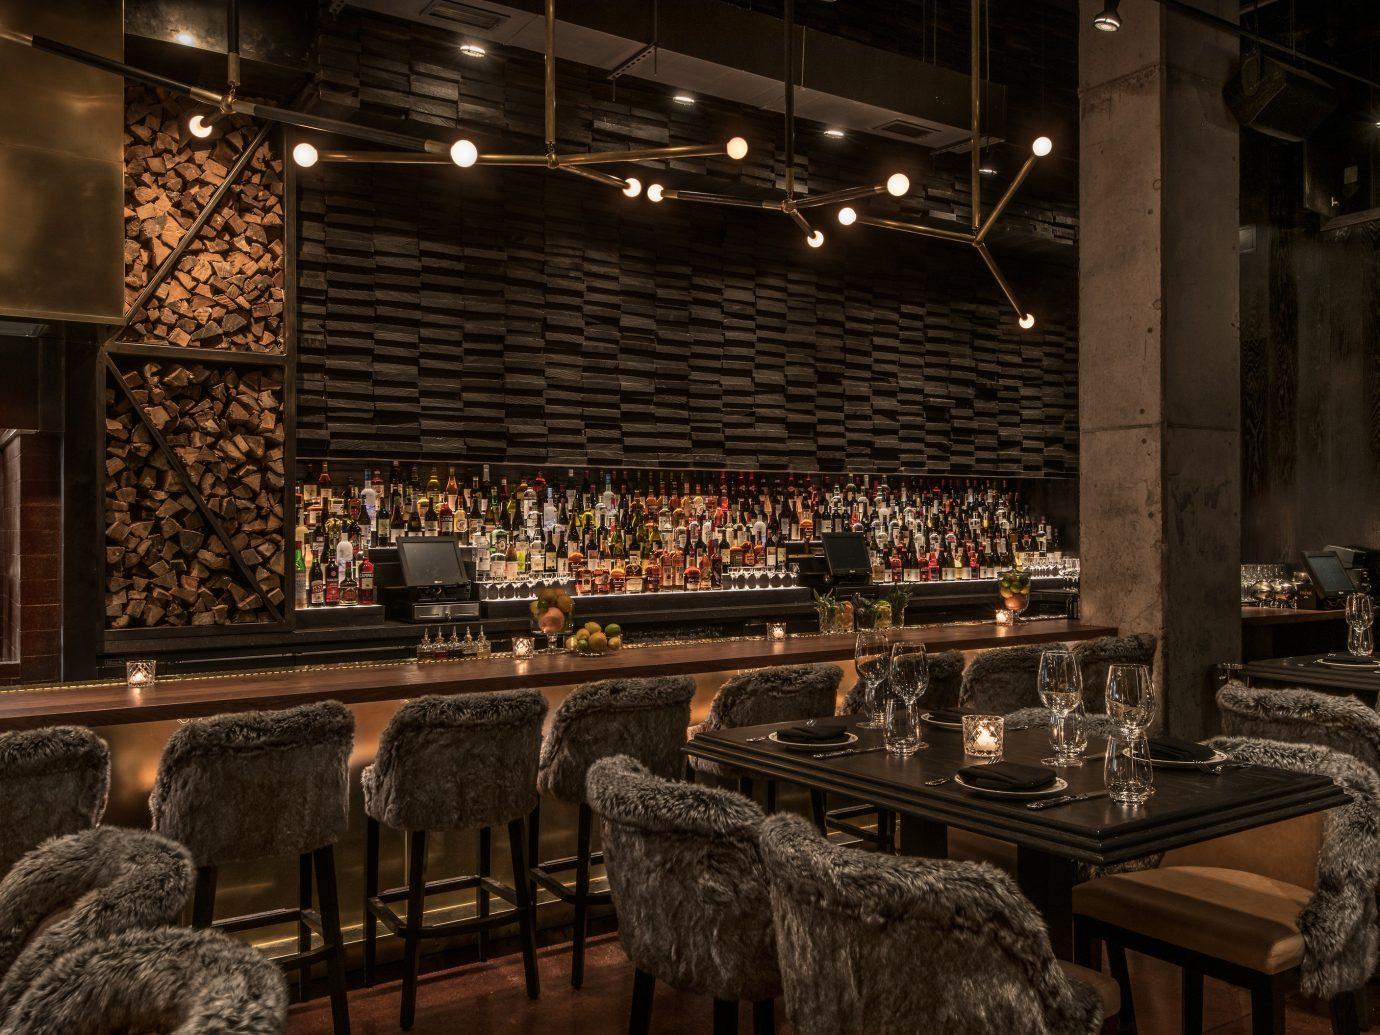 Food + Drink indoor Bar interior design meal restaurant